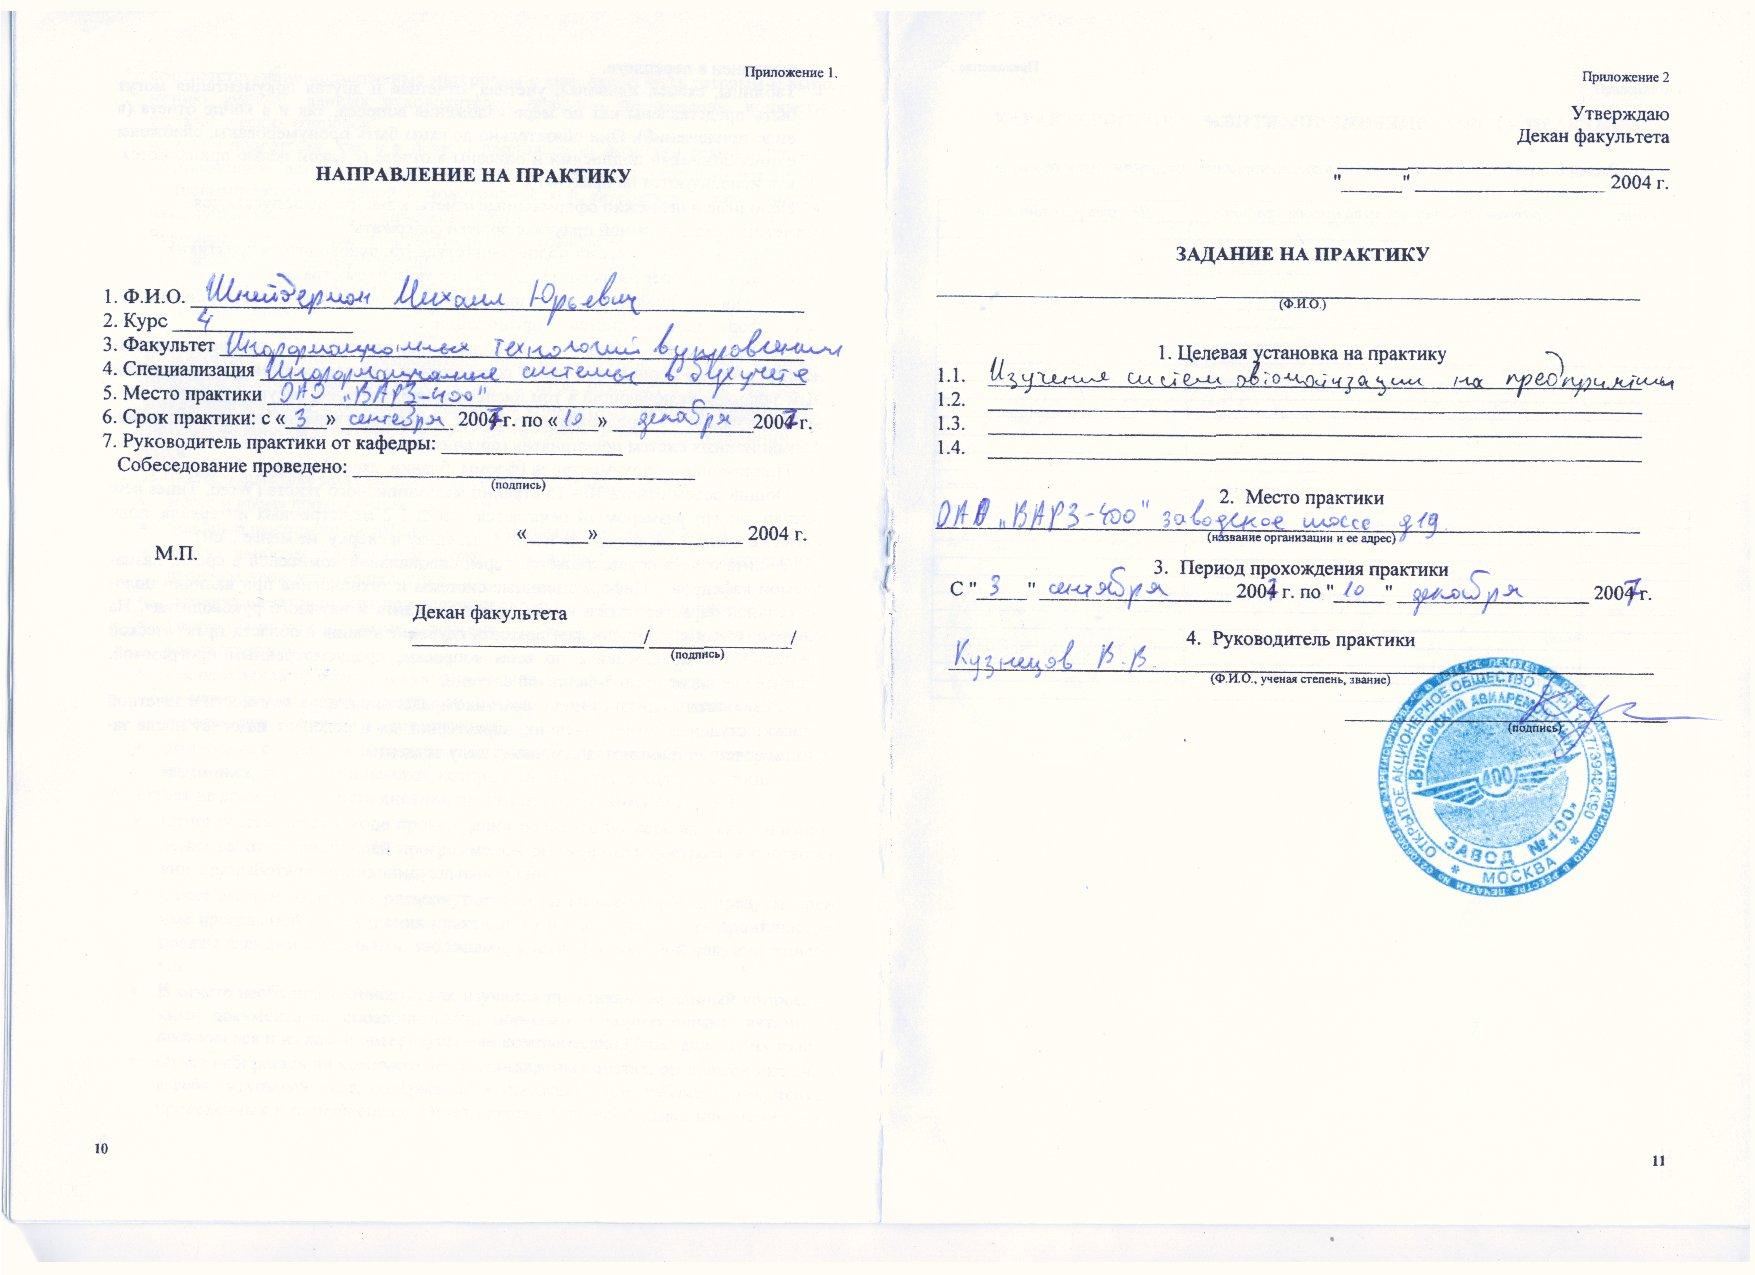 Руководство по написанию отчёта по практике МИГКУ ИТ вс Форма в комплекте документов